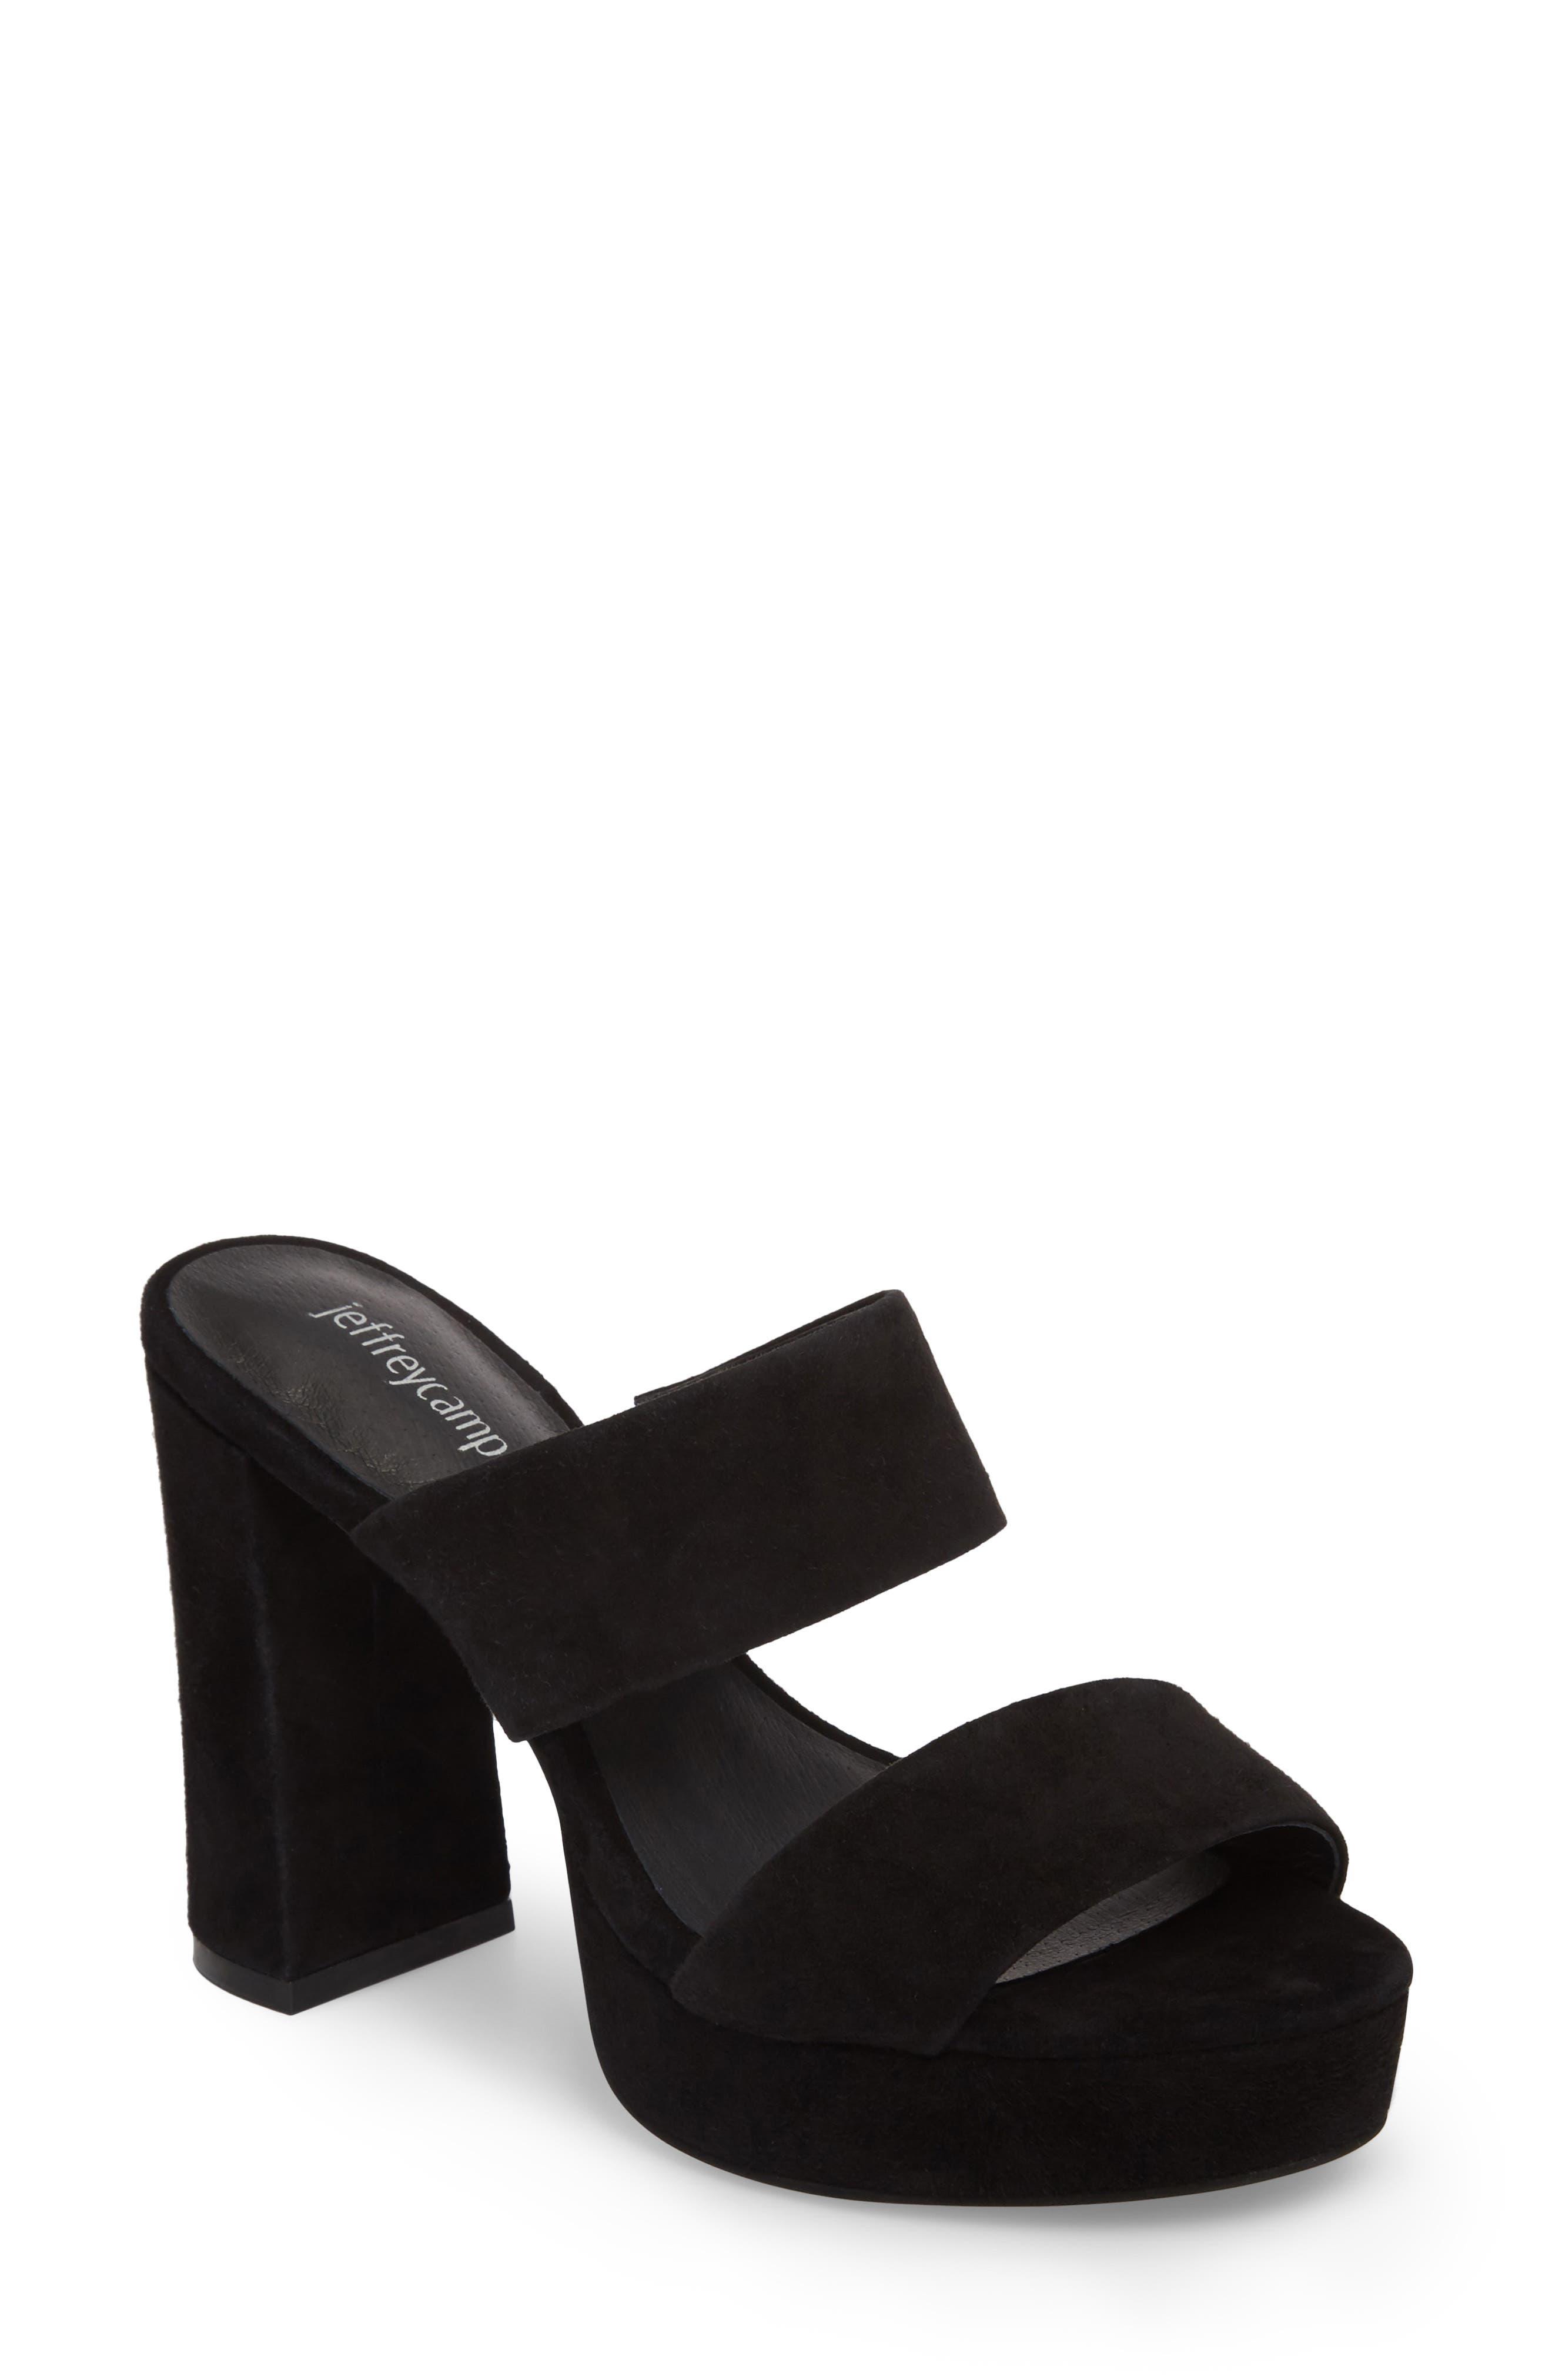 Adriana Double Band Platform Sandal,                             Main thumbnail 1, color,                             005